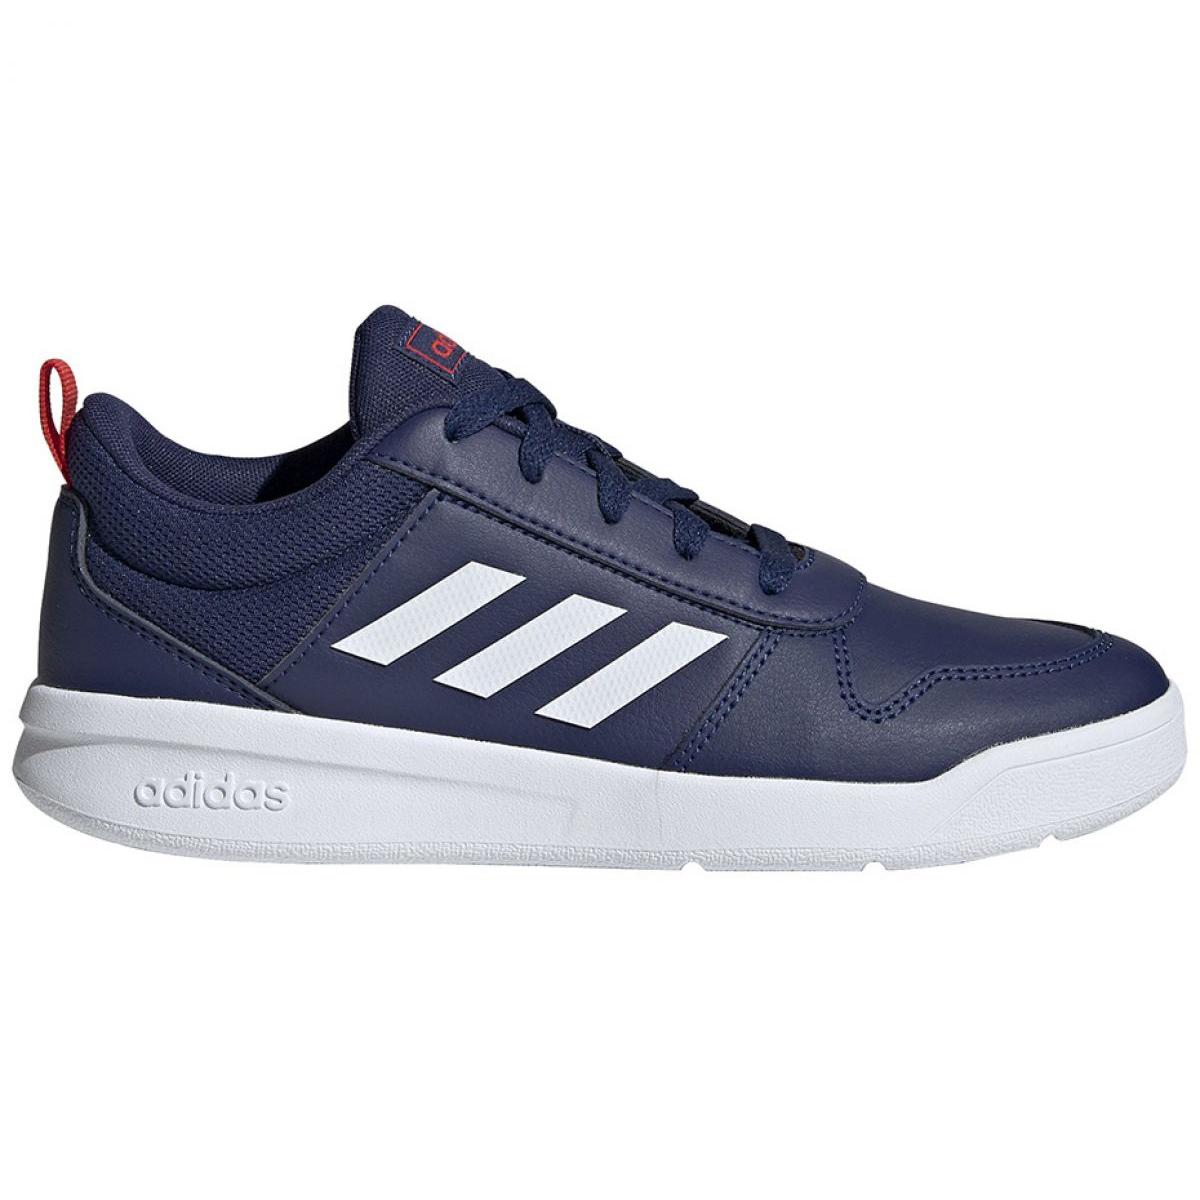 adidas iskolai cipő 6. méret